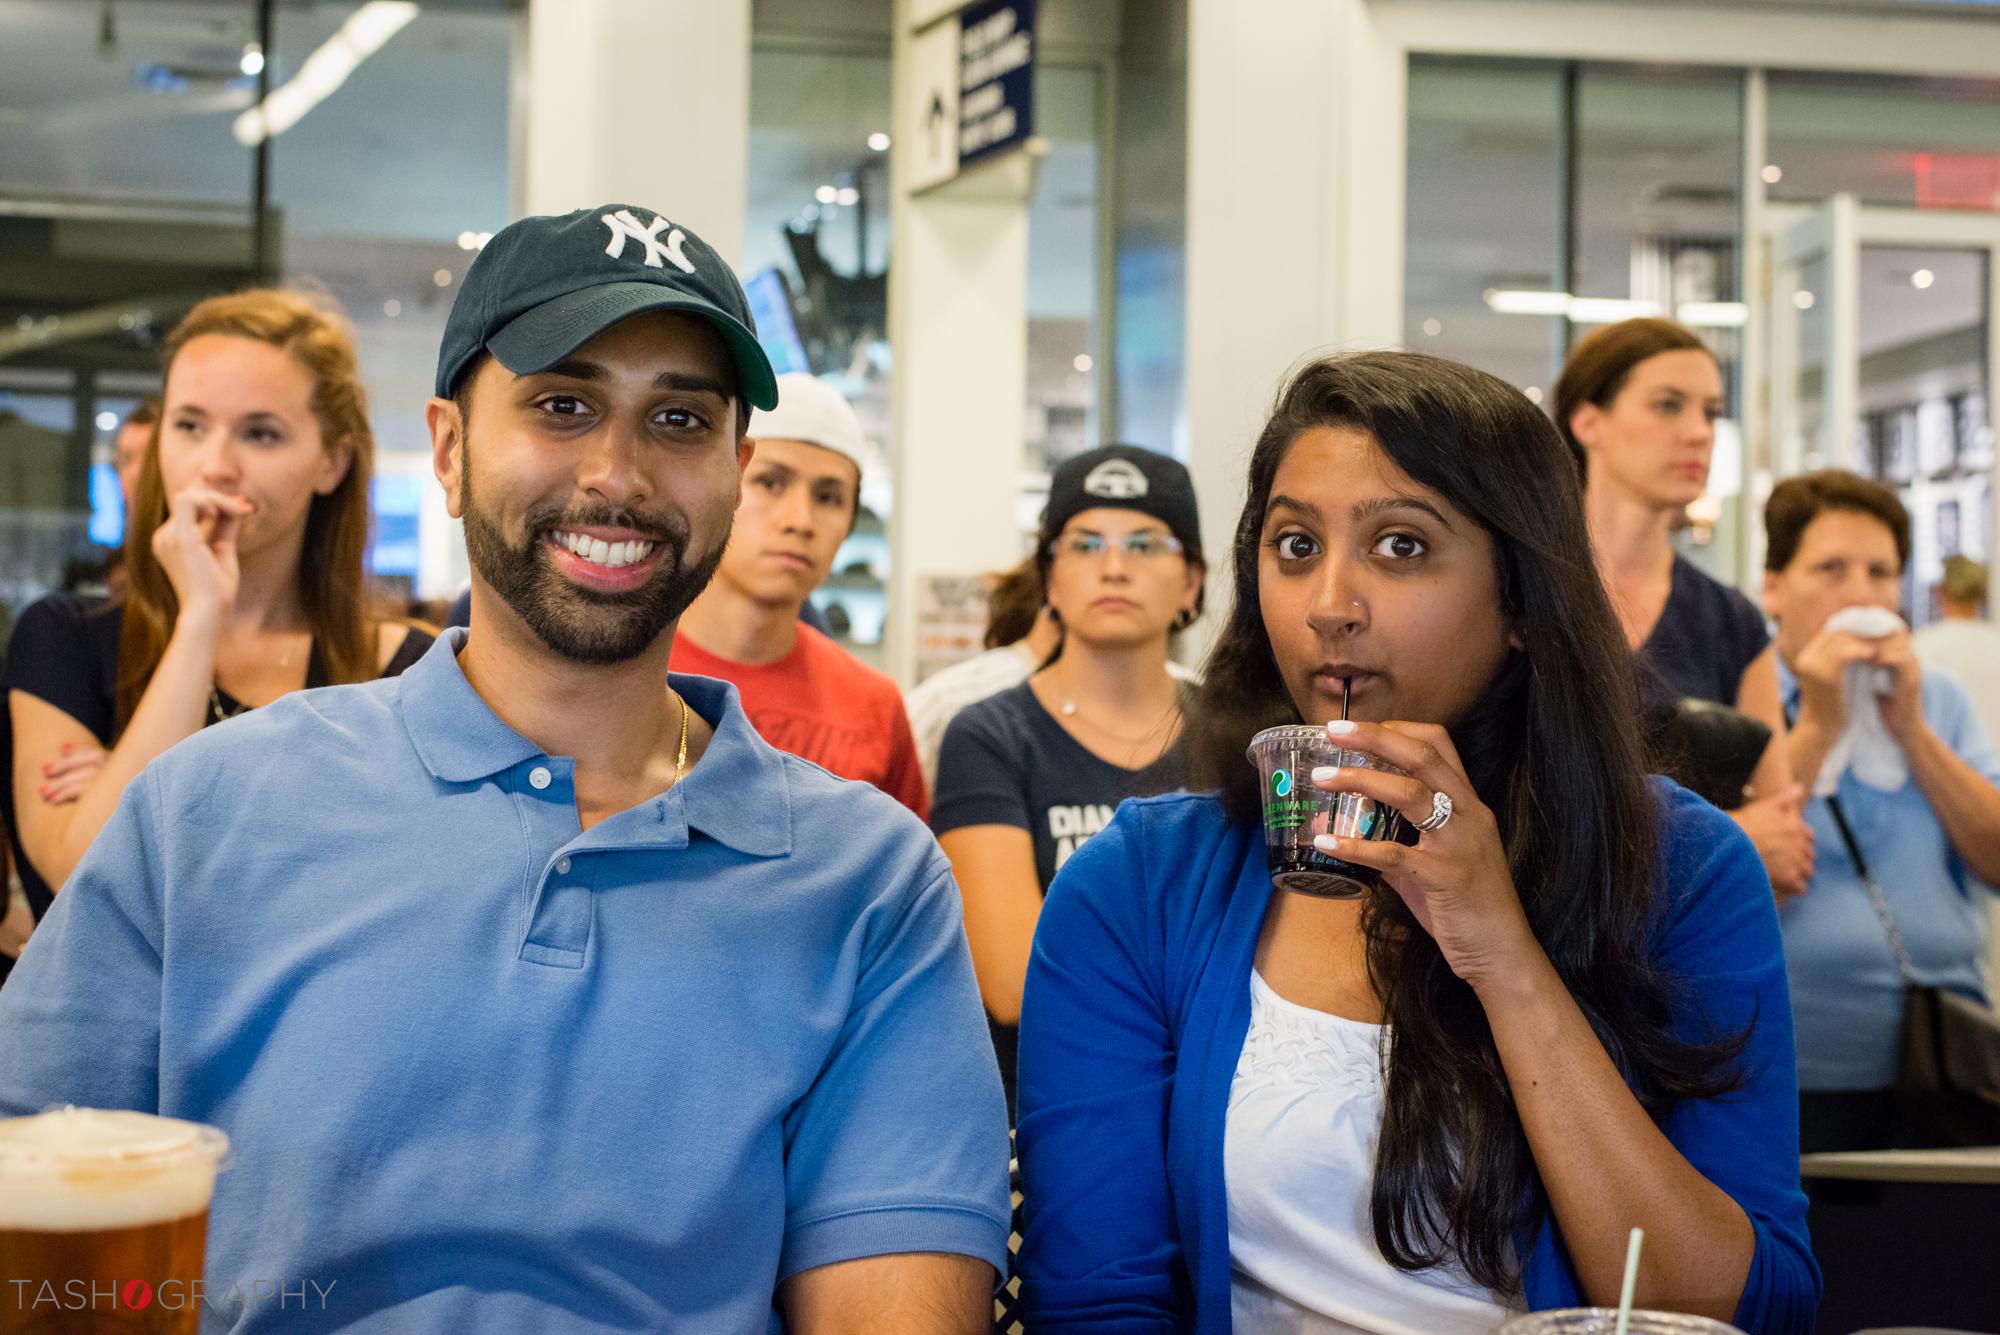 Yankees-090314-47.jpg